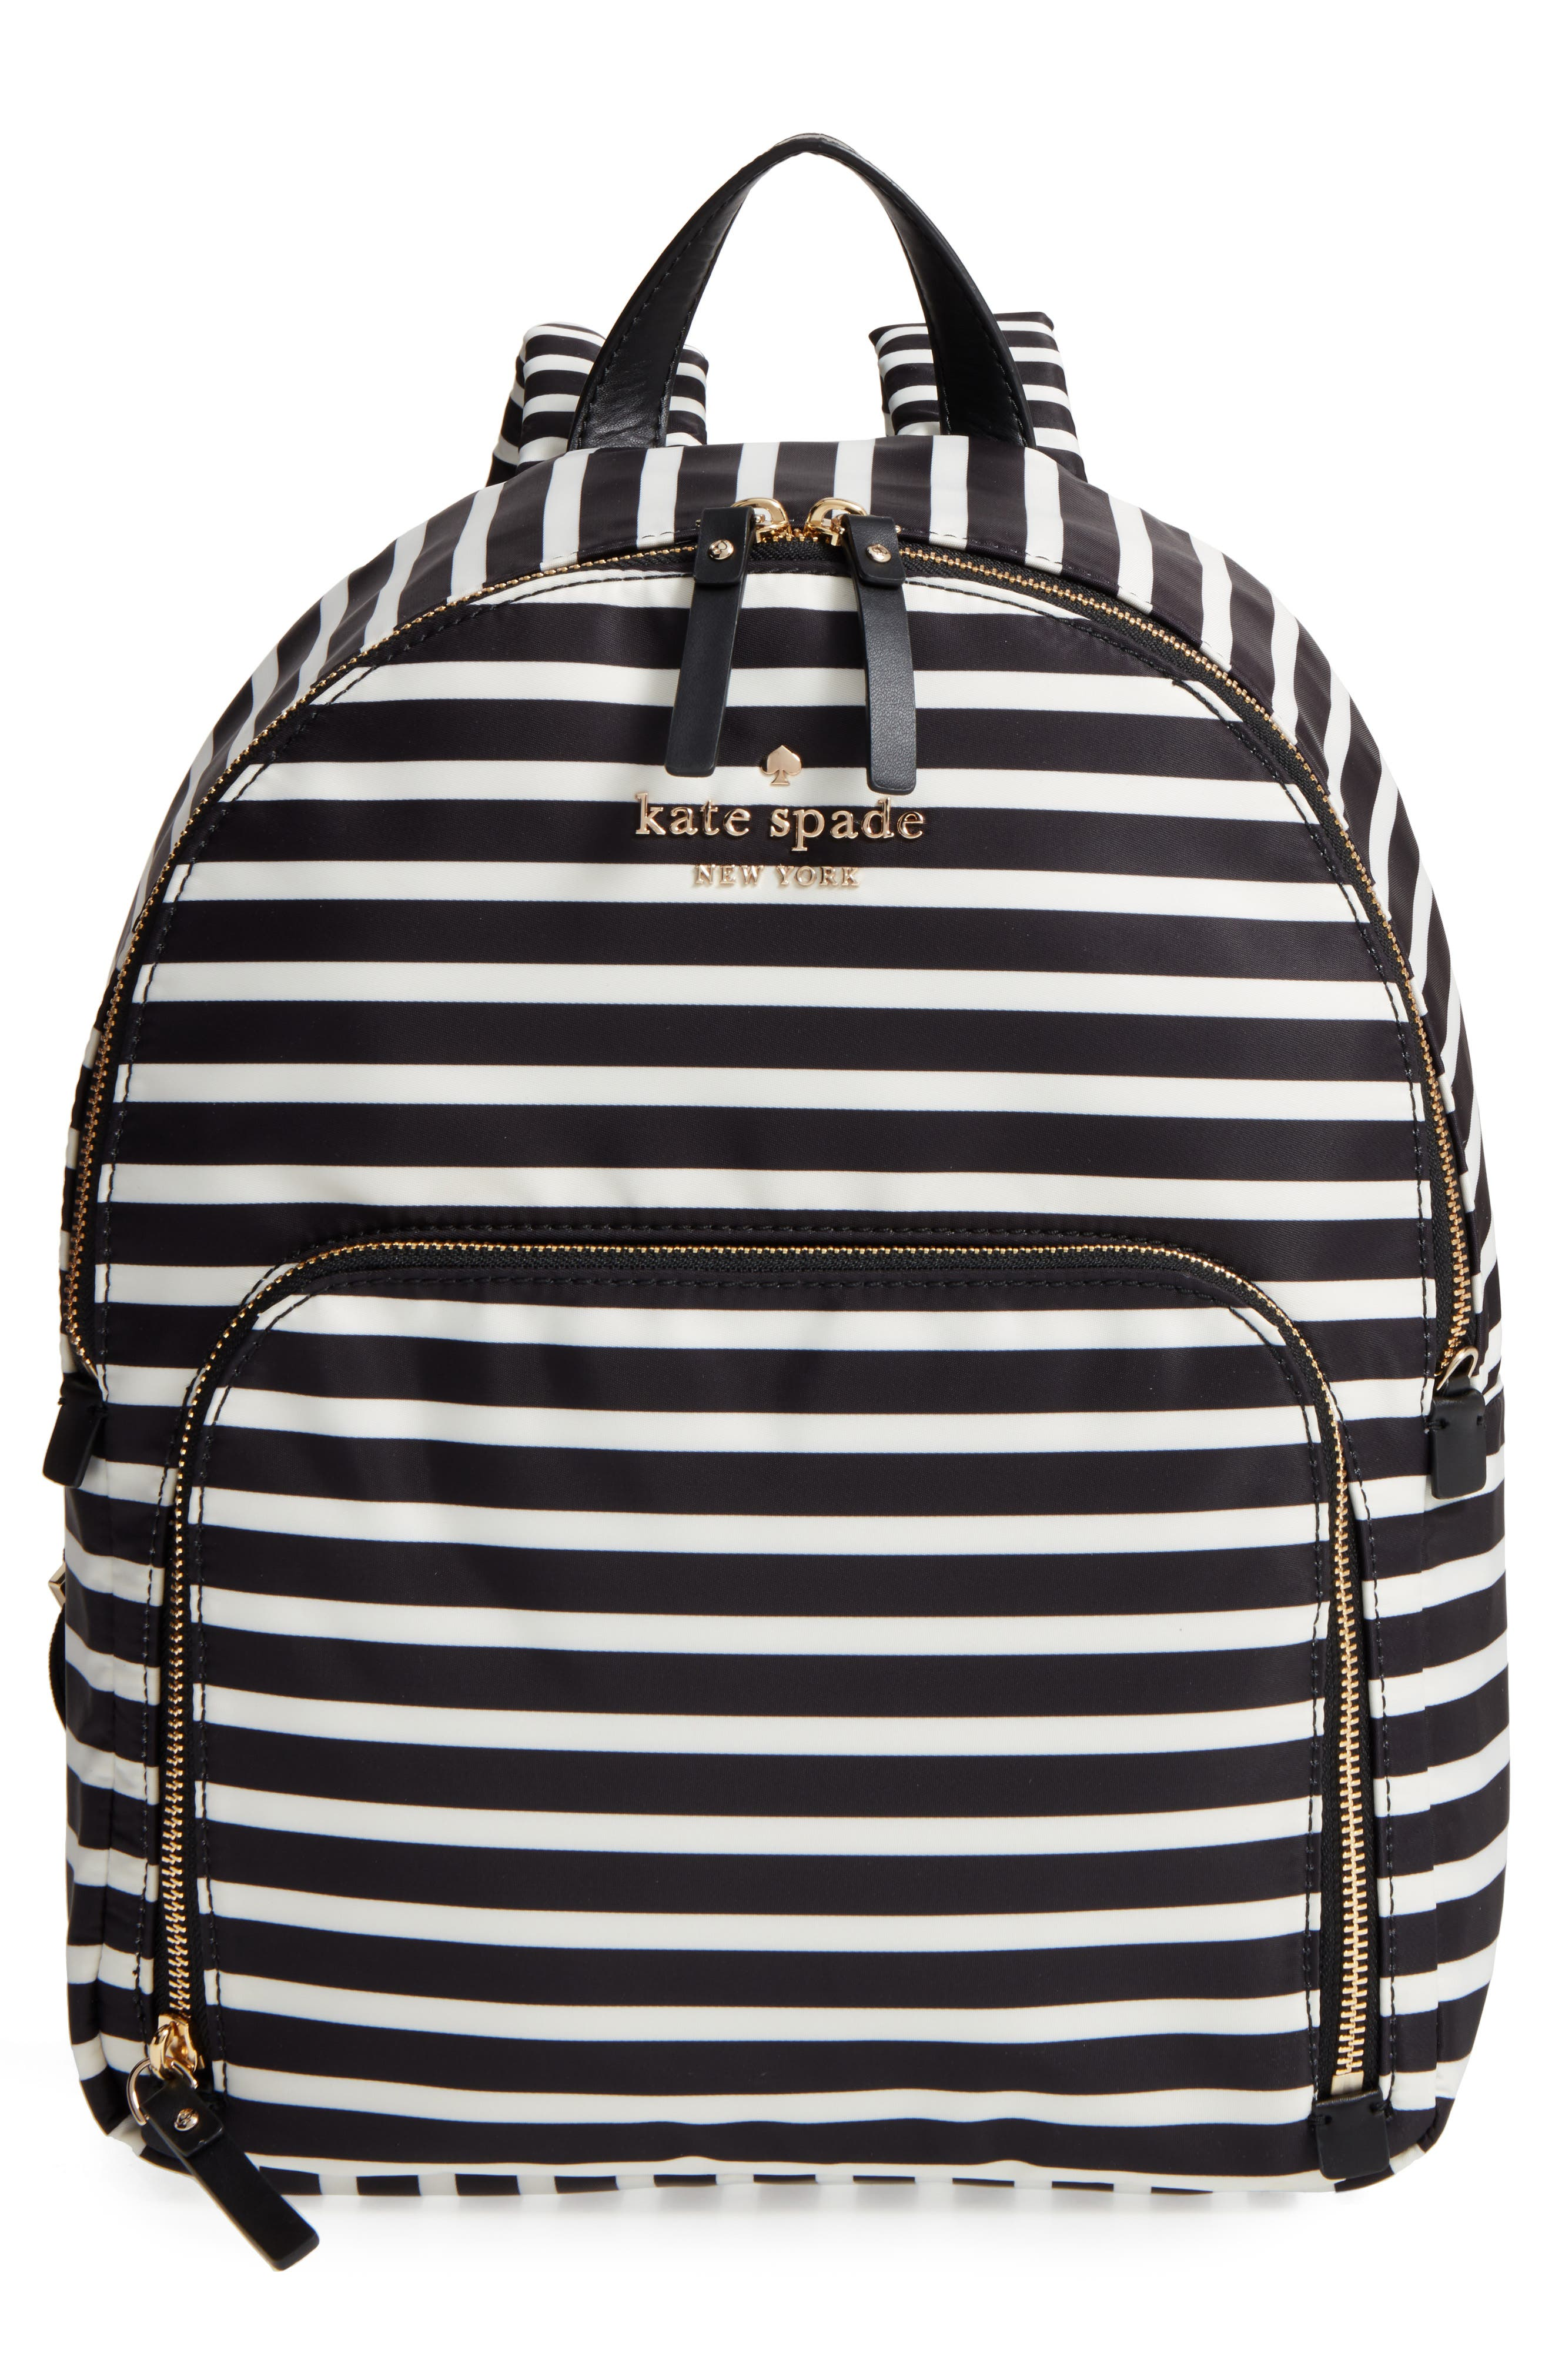 watson lane - hartley nylon backpack,                         Main,                         color, BLACK/ CLOTTED CREAM